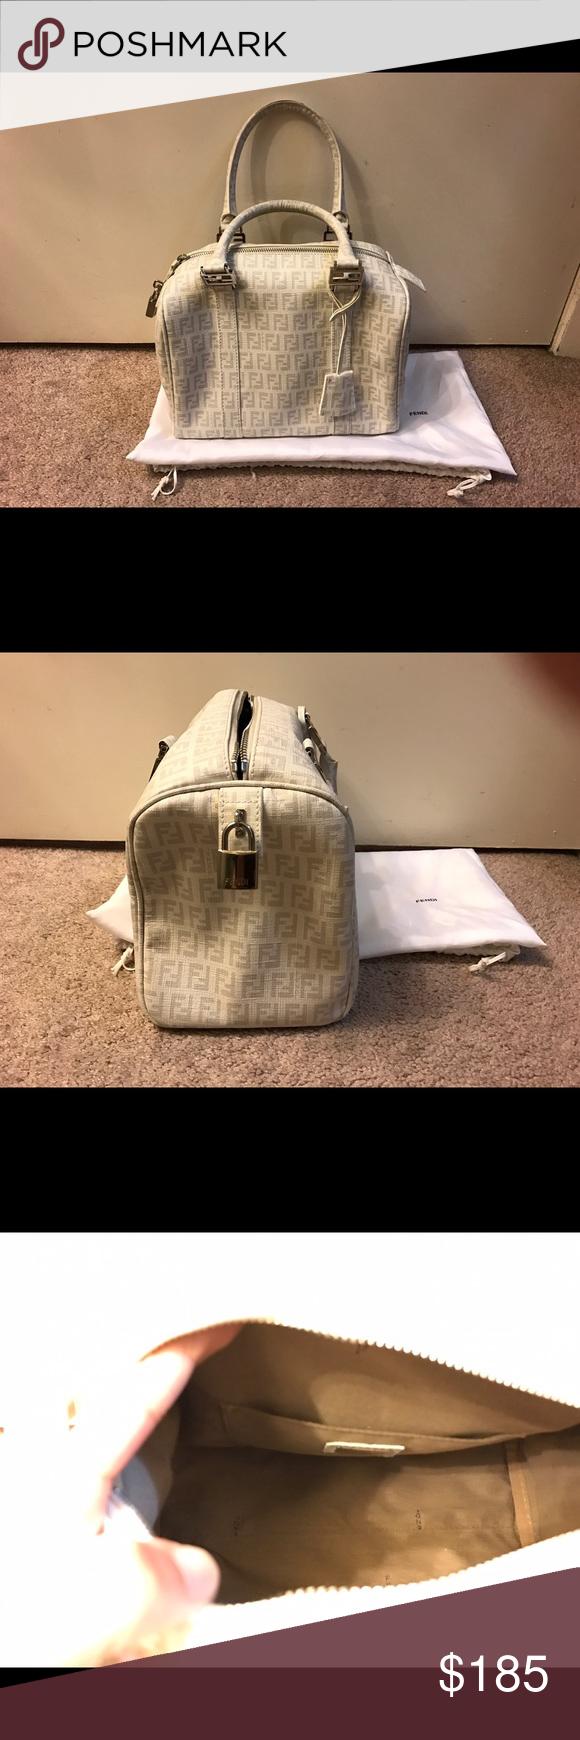 official fendi bag inside tag 2504d 3dedc 757e372a39